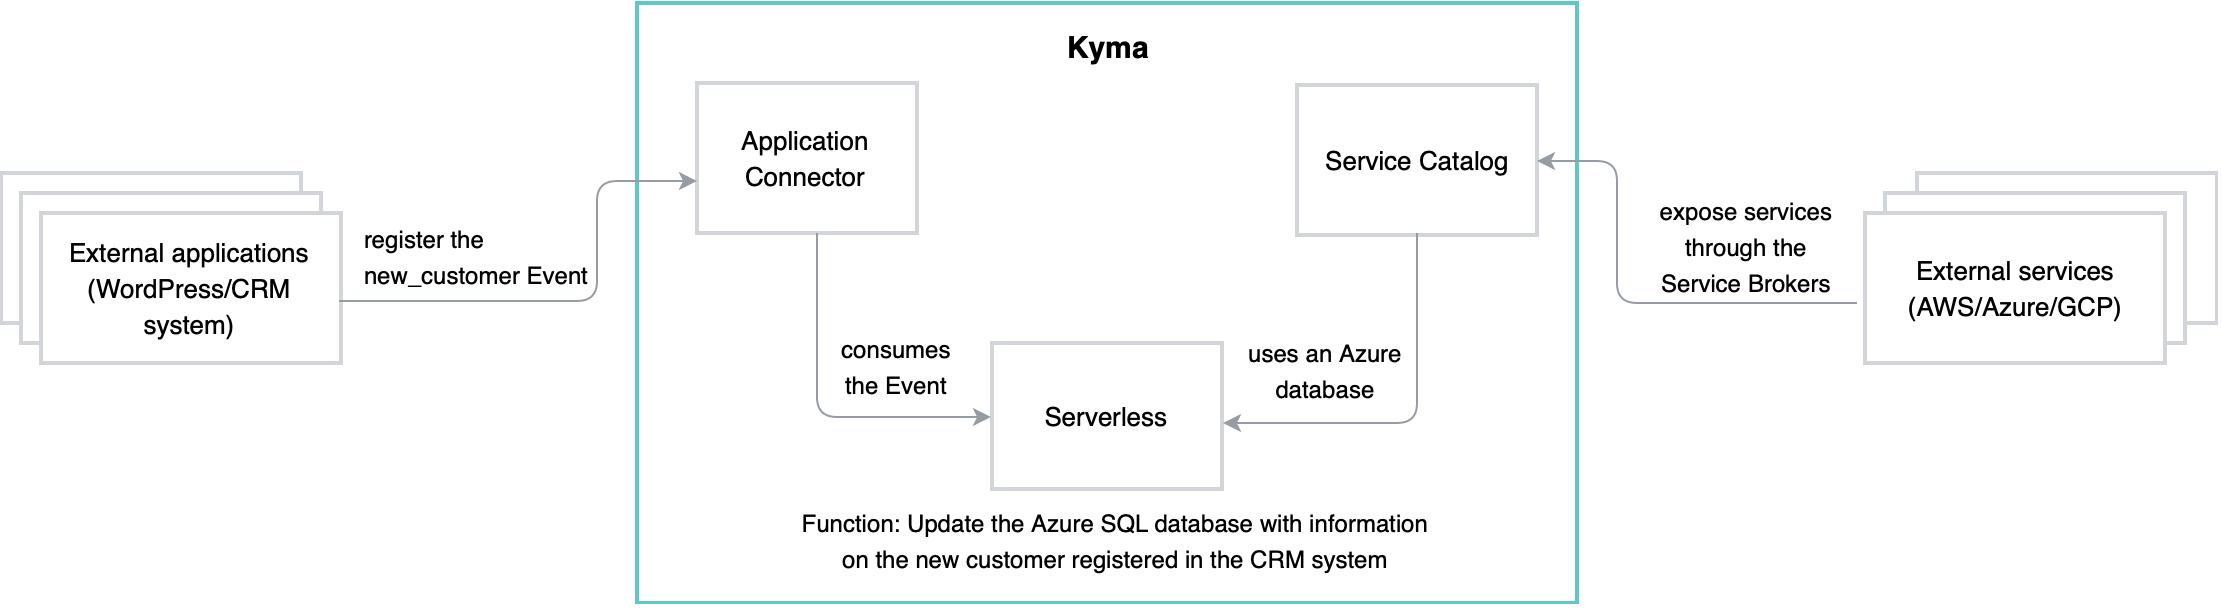 Kyma%20Architecture